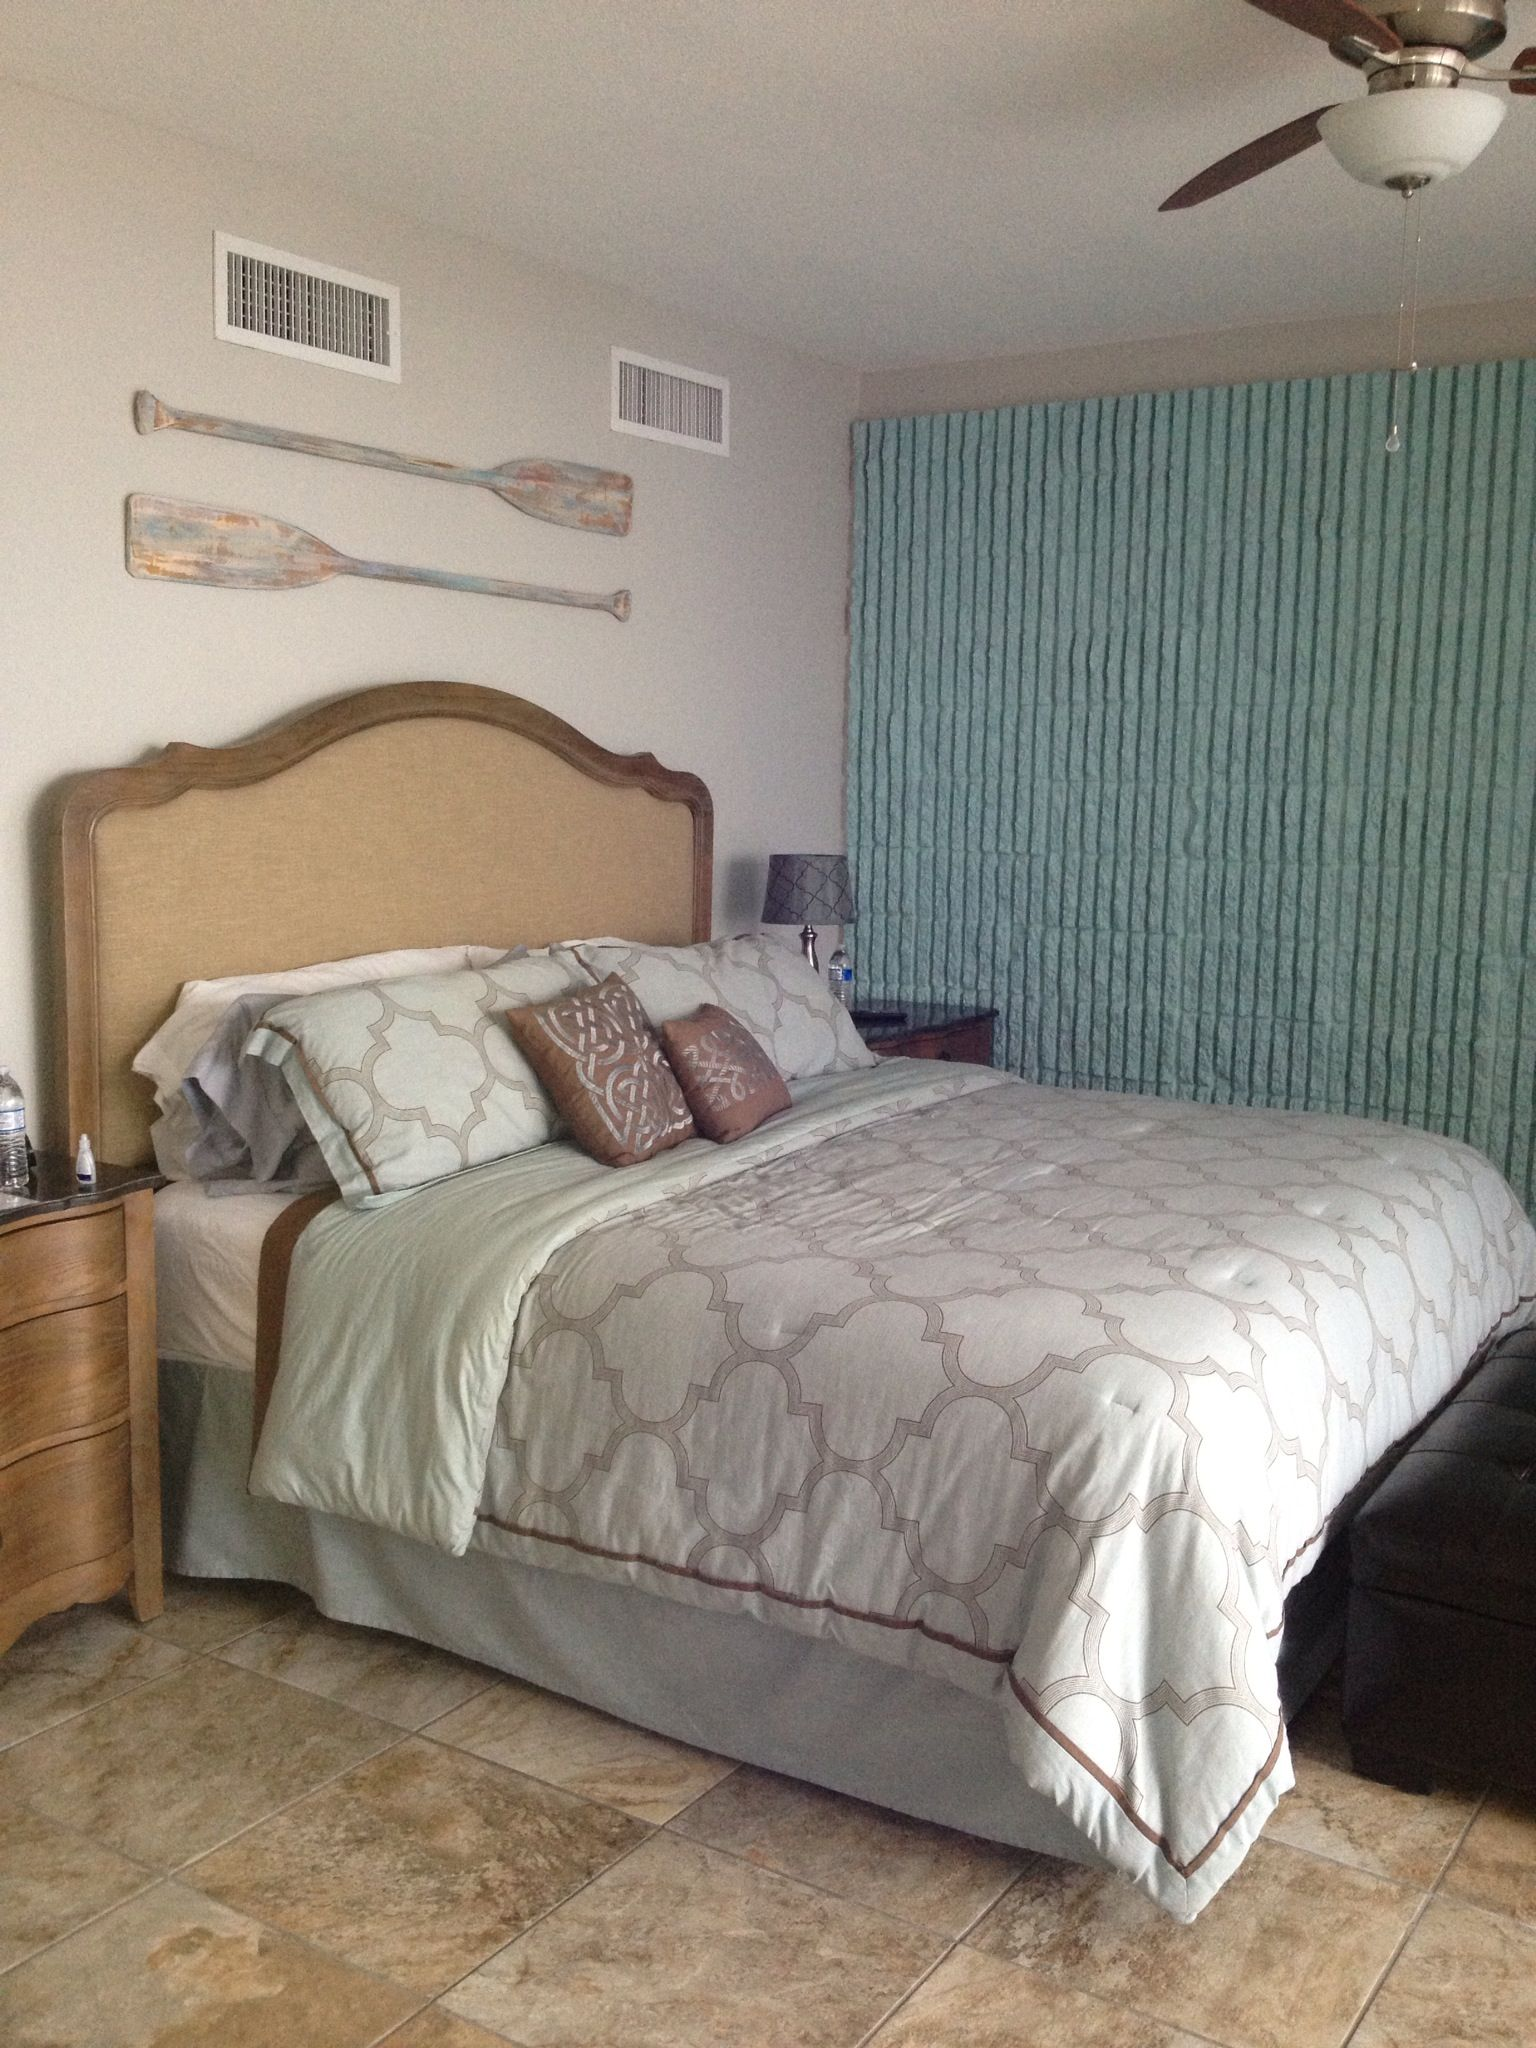 Oars Over Master Bedroom 39 S King Size Bed Coastal Decor Pinterest